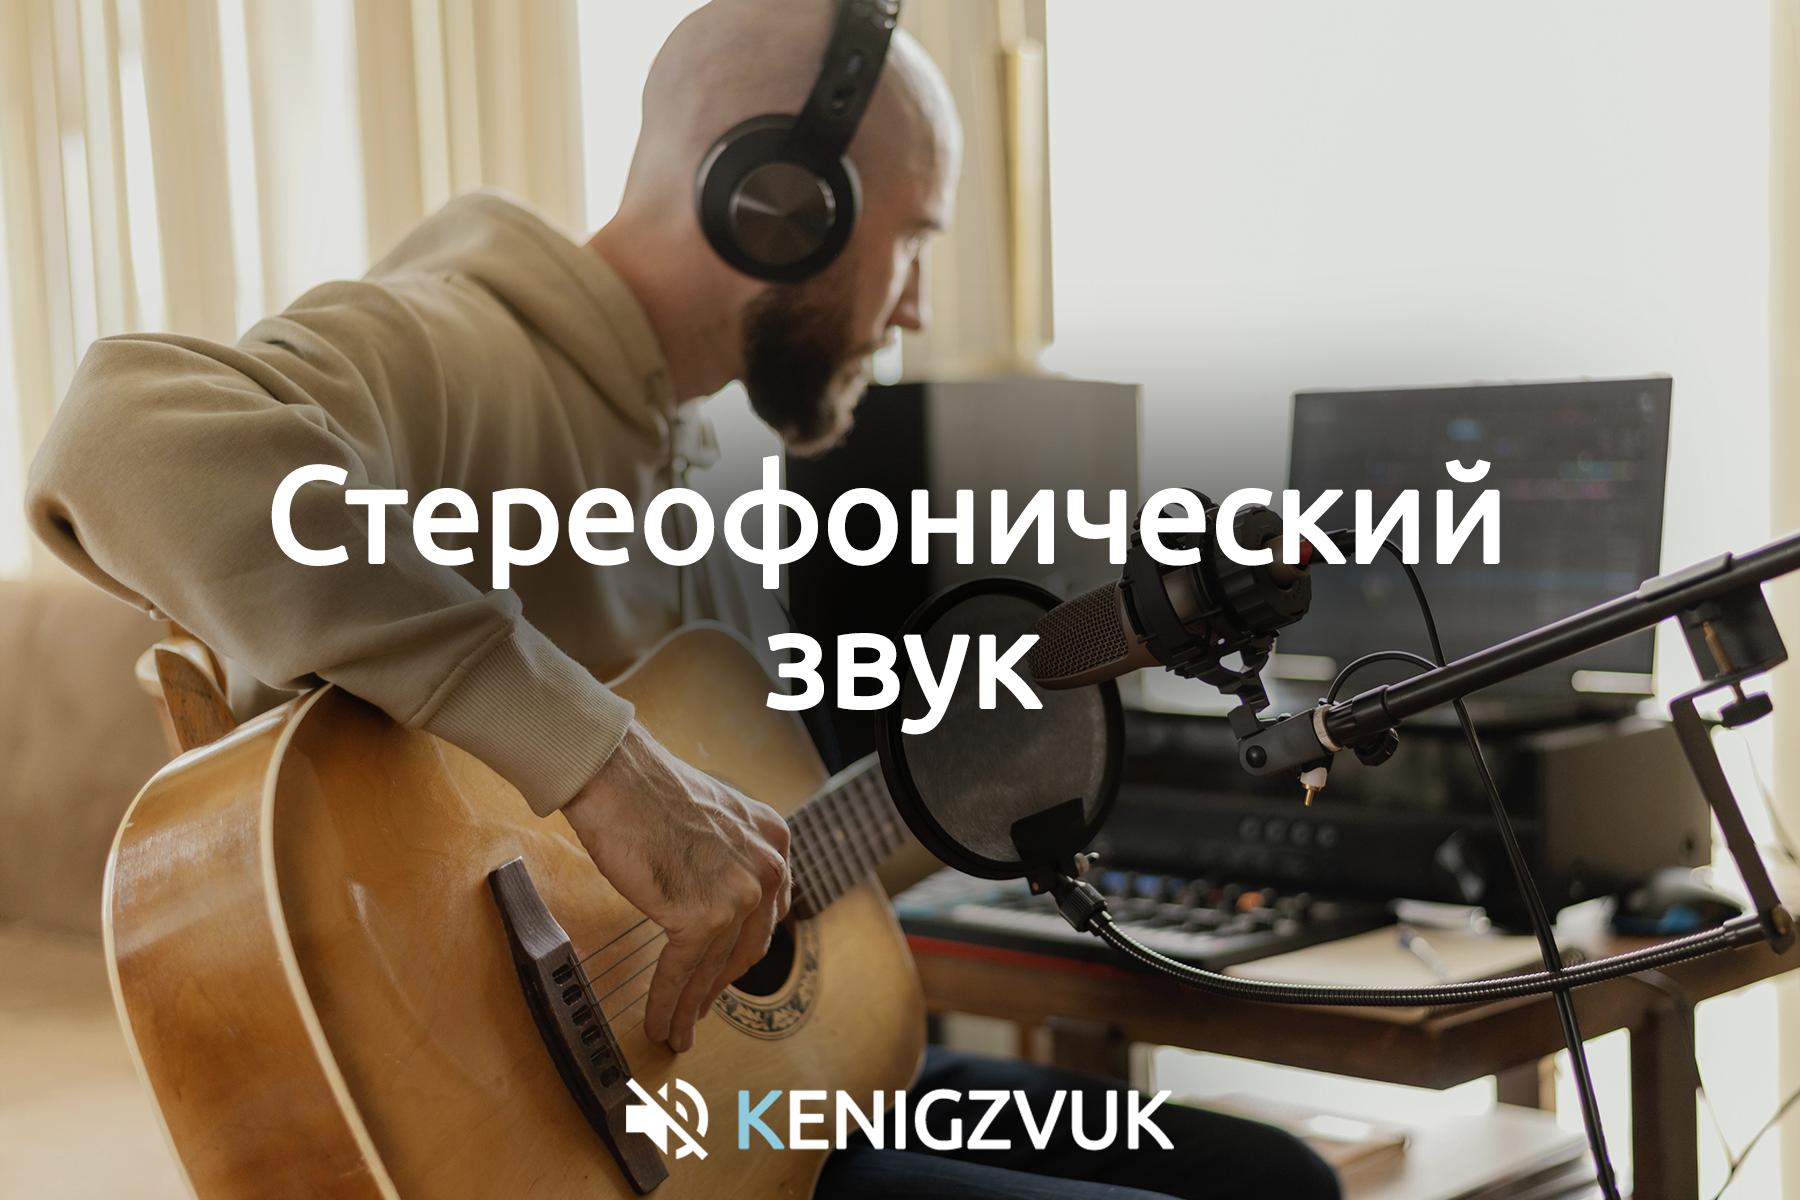 KenigZvuk | Звукоизоляция Калининград - Стереофонический звук